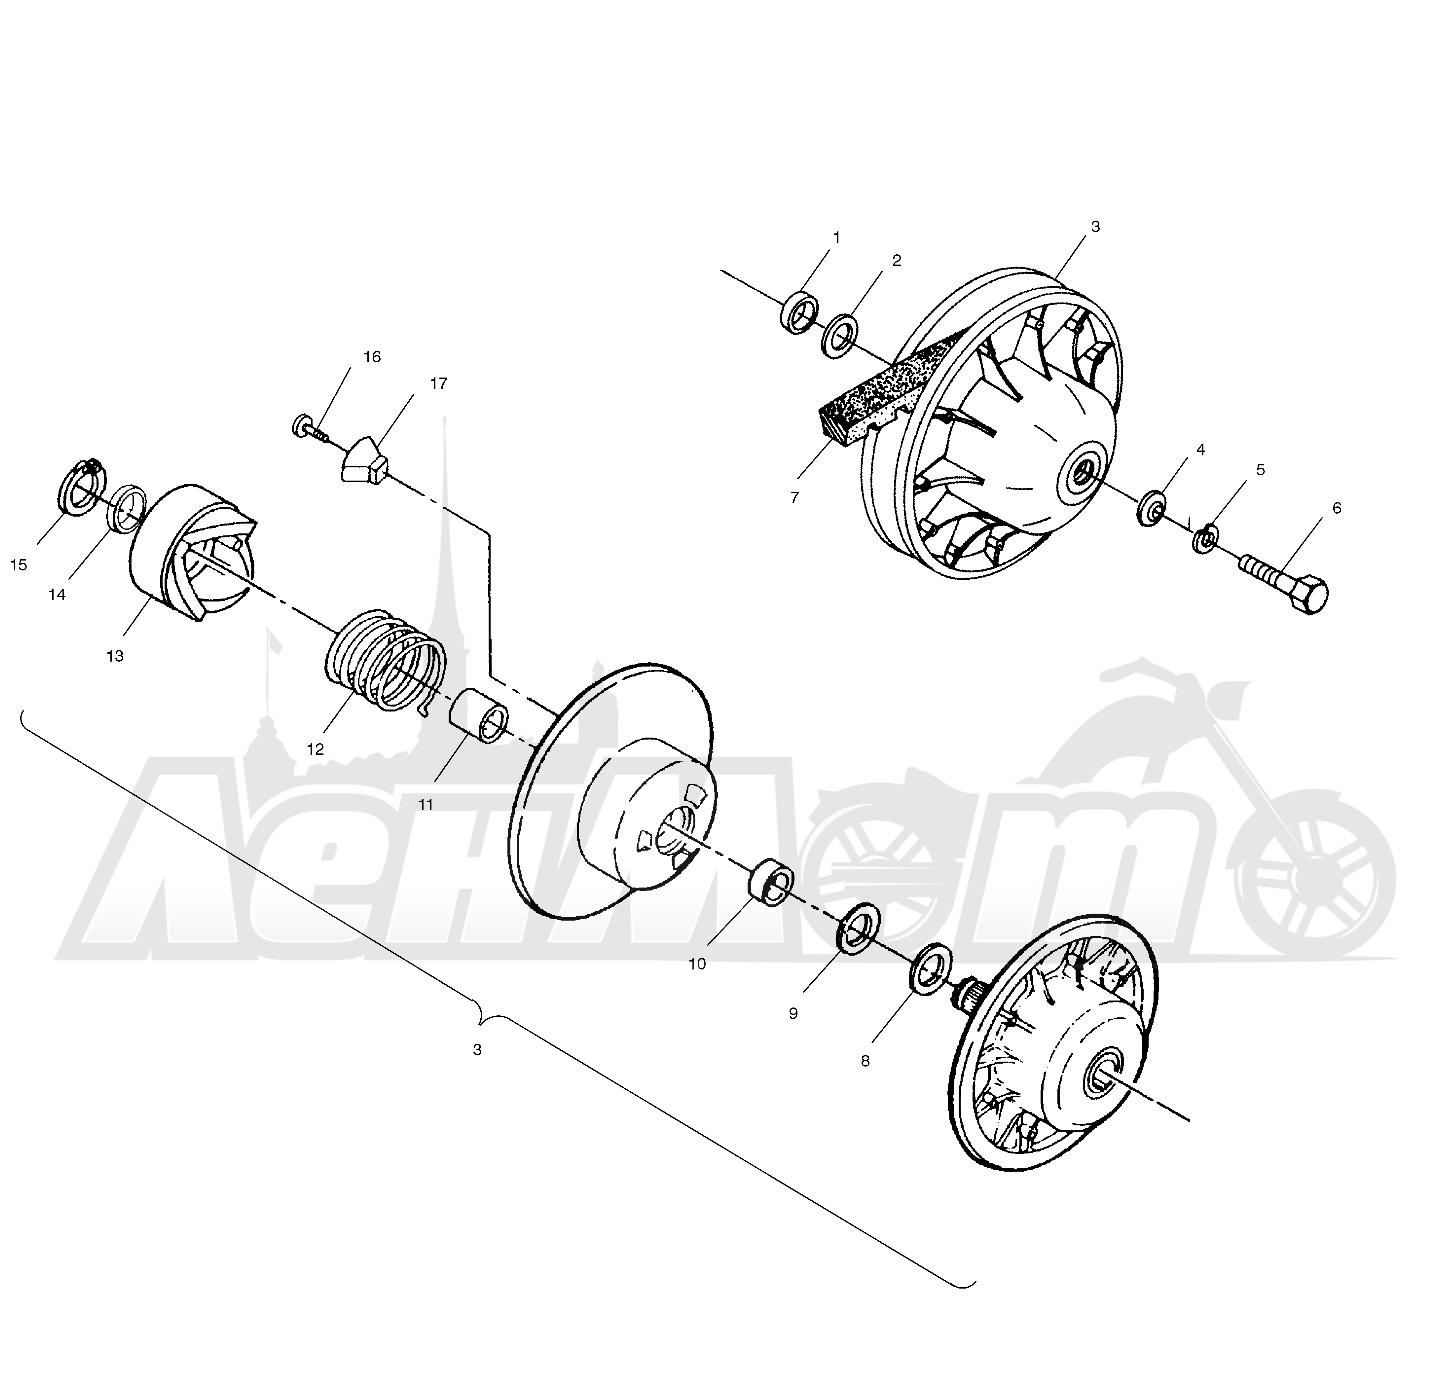 Запчасти для Квадроцикла Polaris 1997 SWEDISH SPORTSMAN 50 - S97CH50E Раздел: DRIVEN CLUTCH - W97CH50A | ведомый вариатор W97CH50A